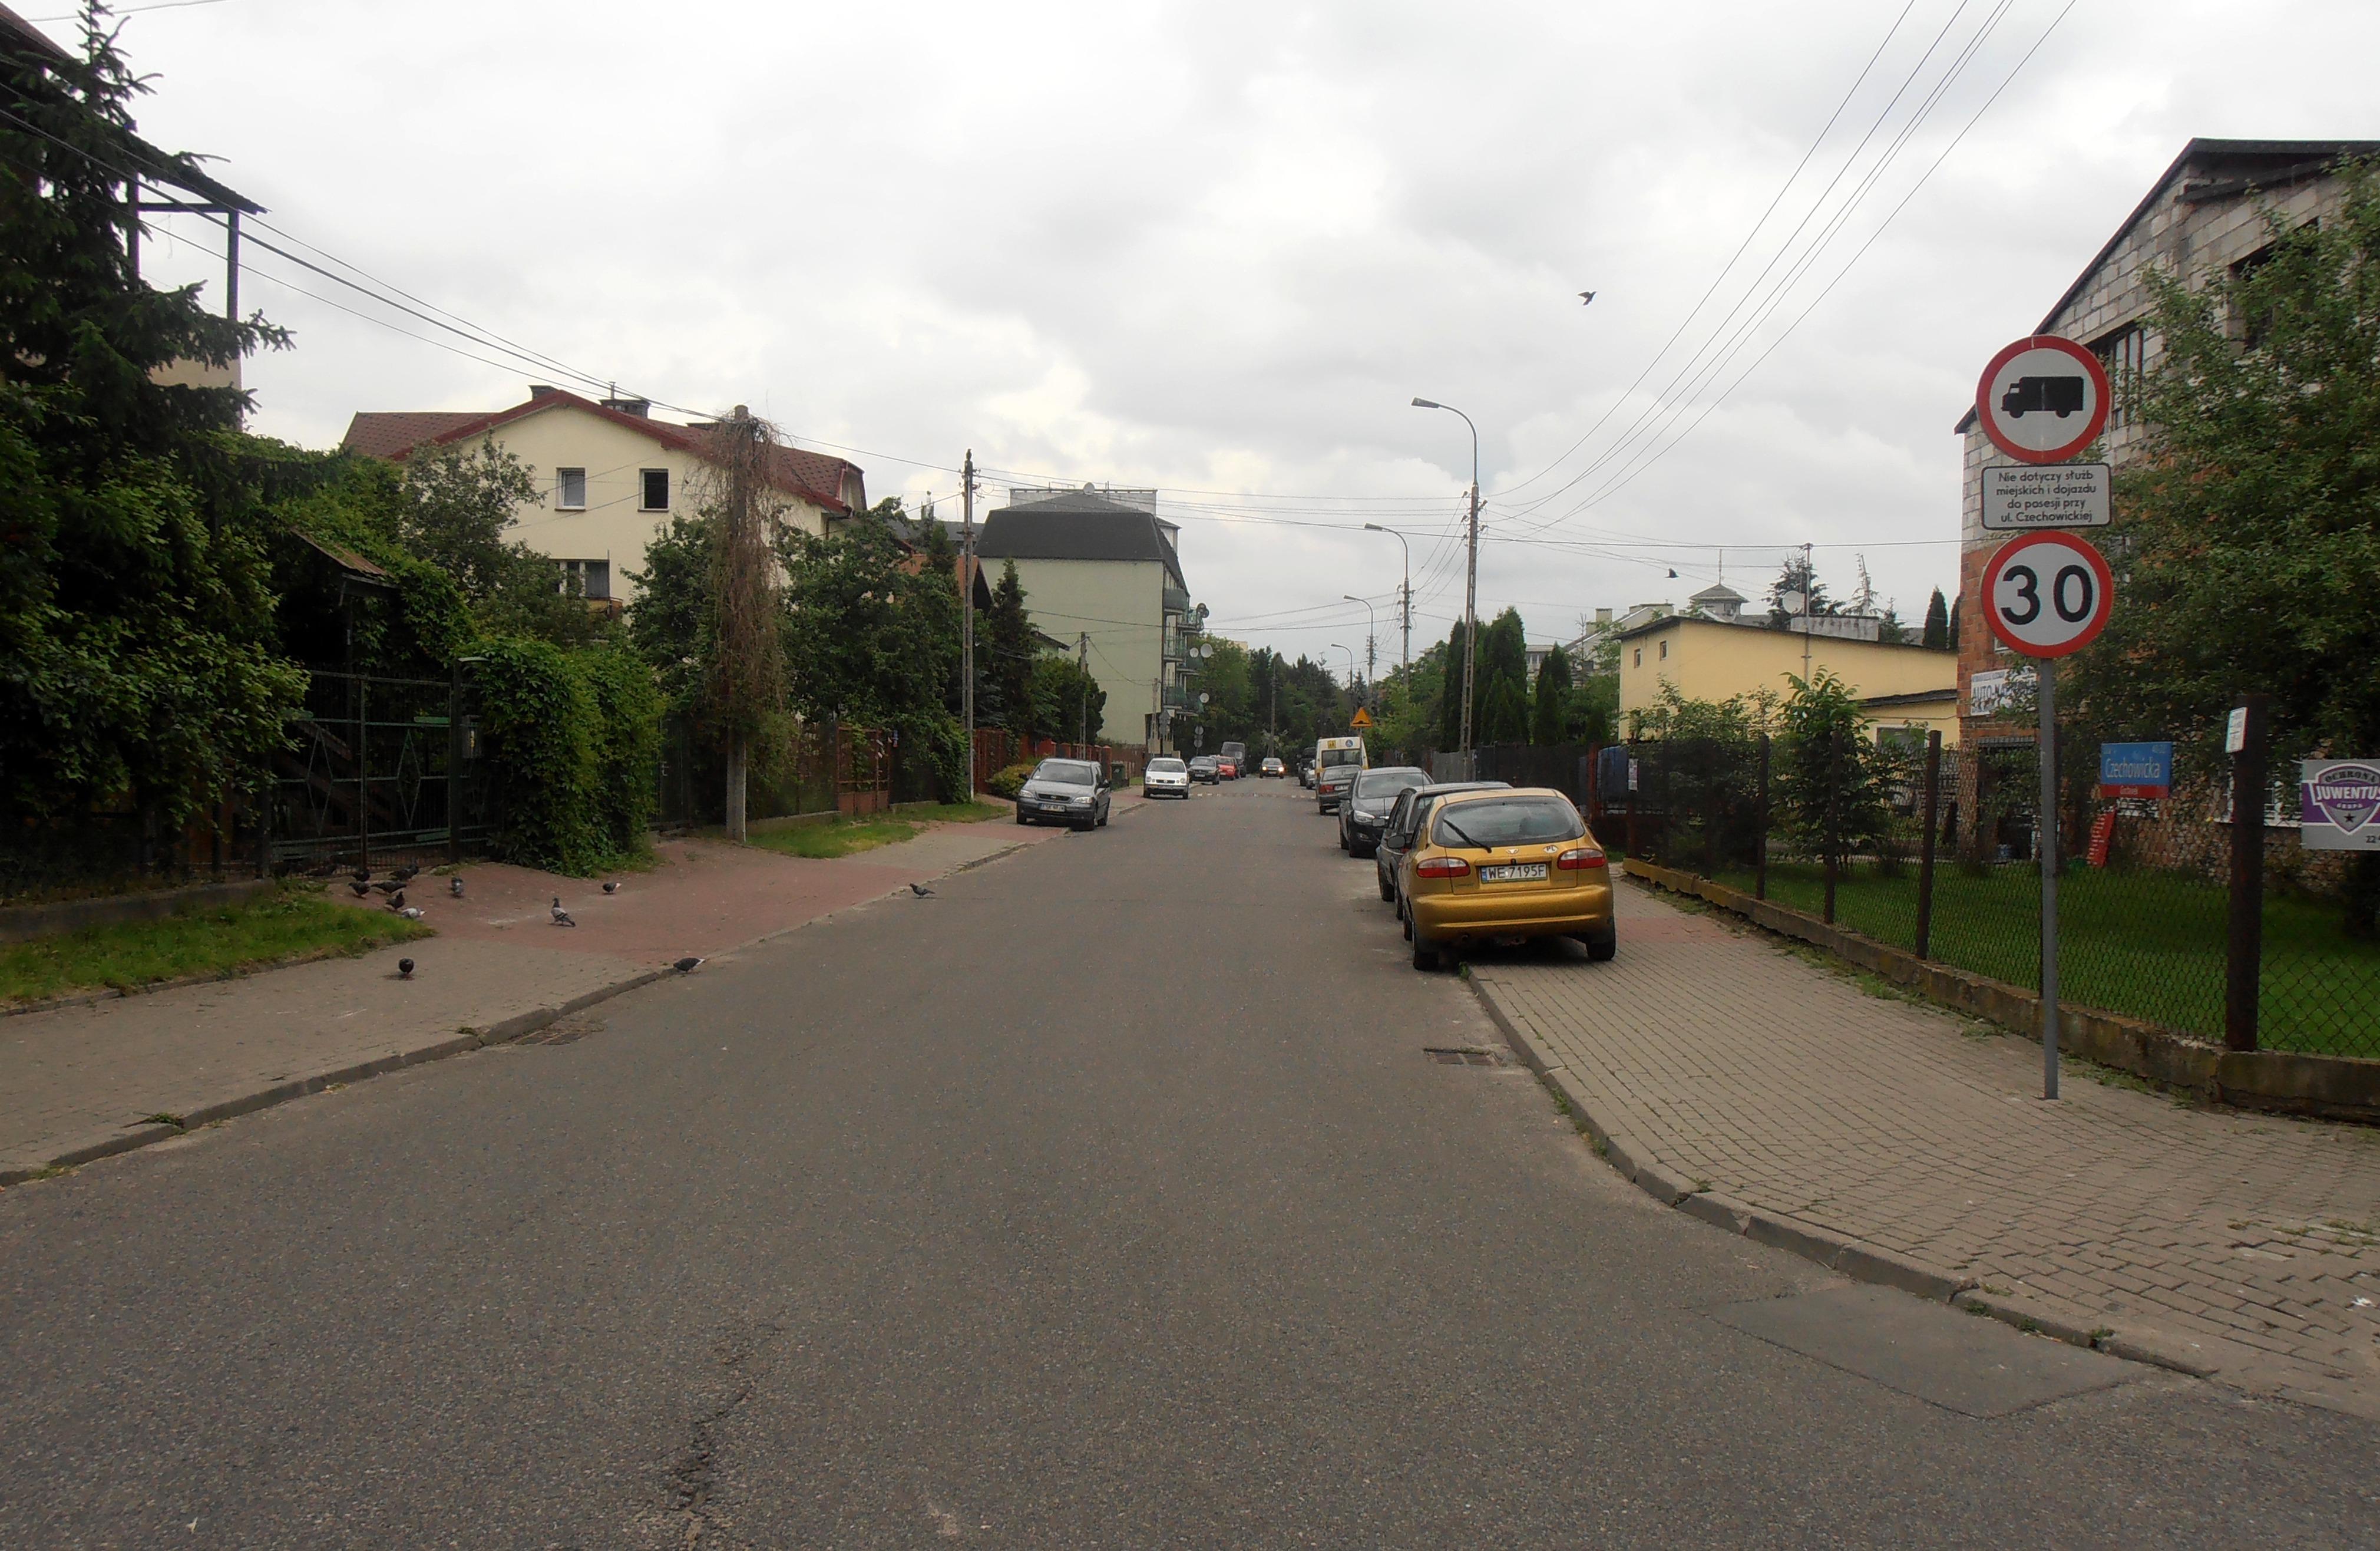 Ulica Czechowicka